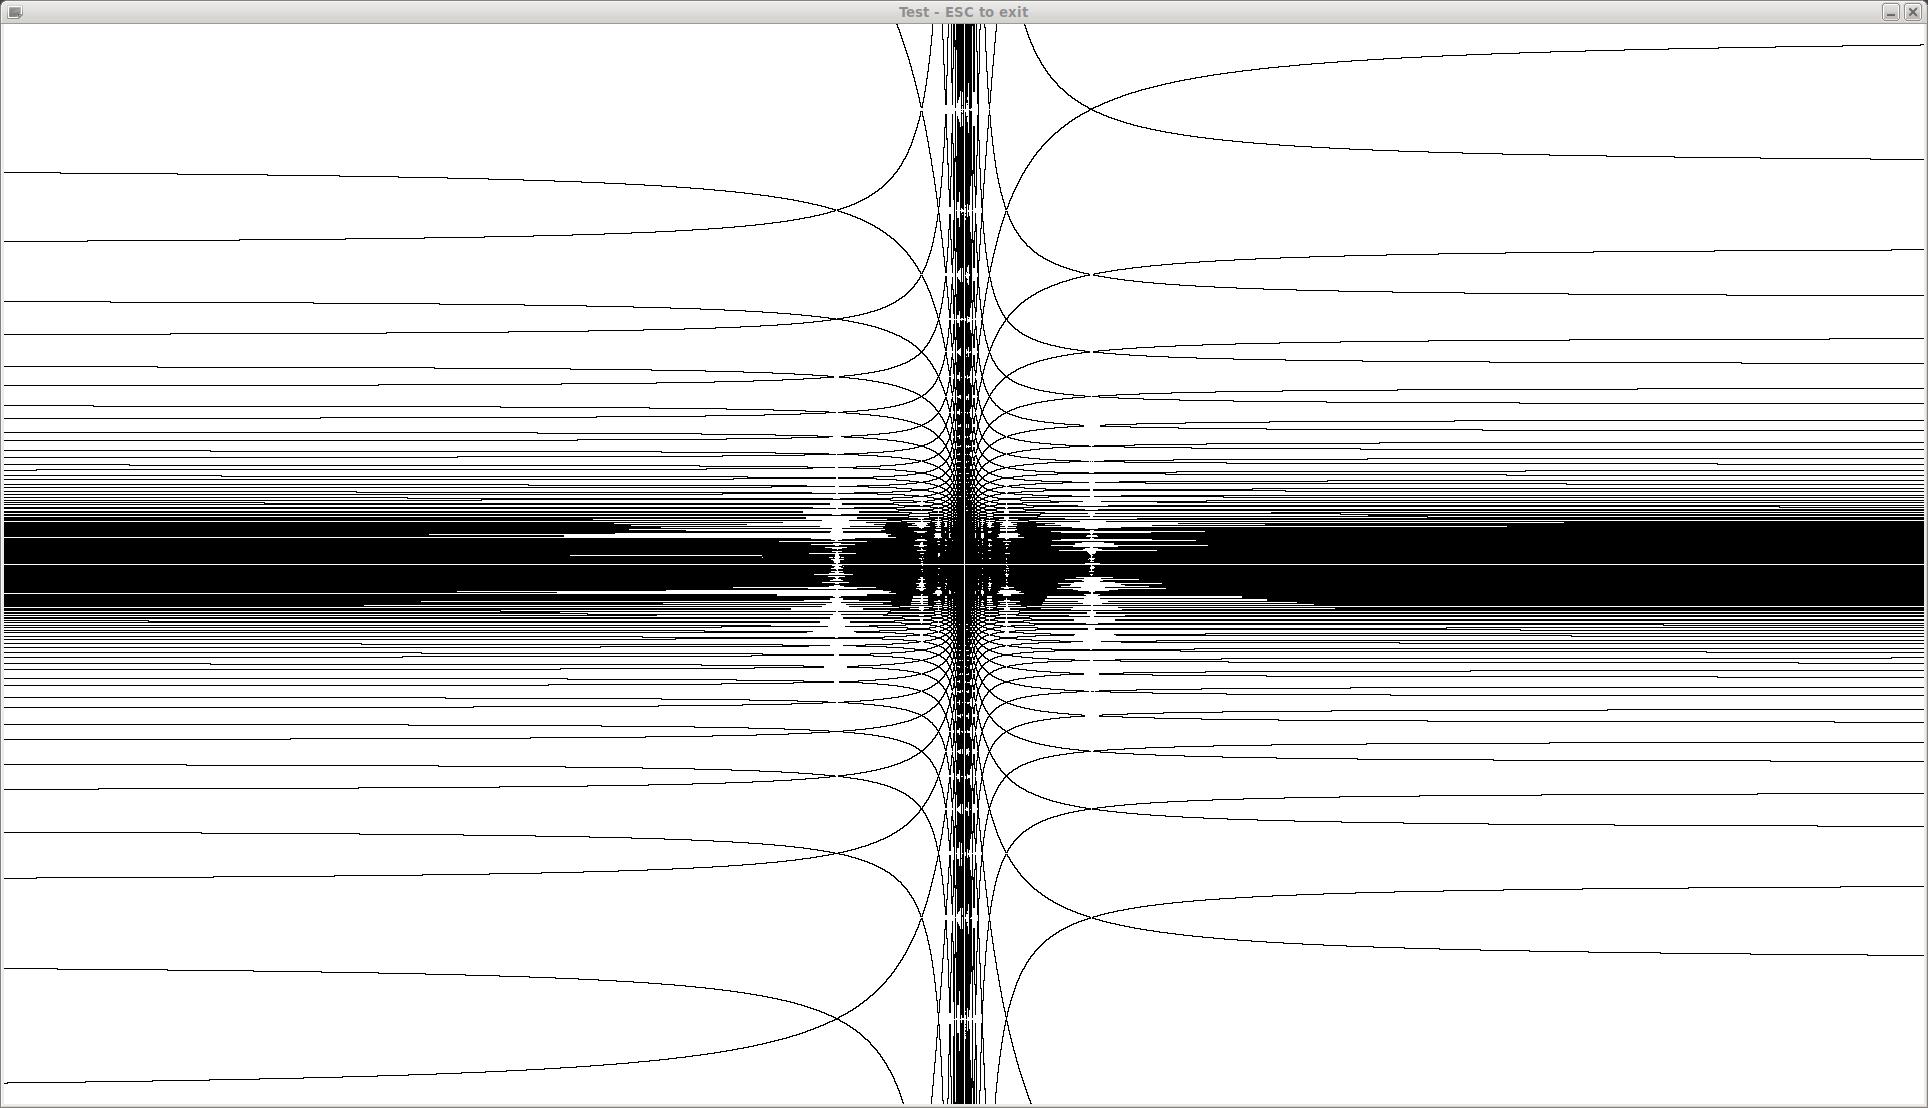 Старт с решётки 2х2, 31 секунда, 69 итераций уточнения.